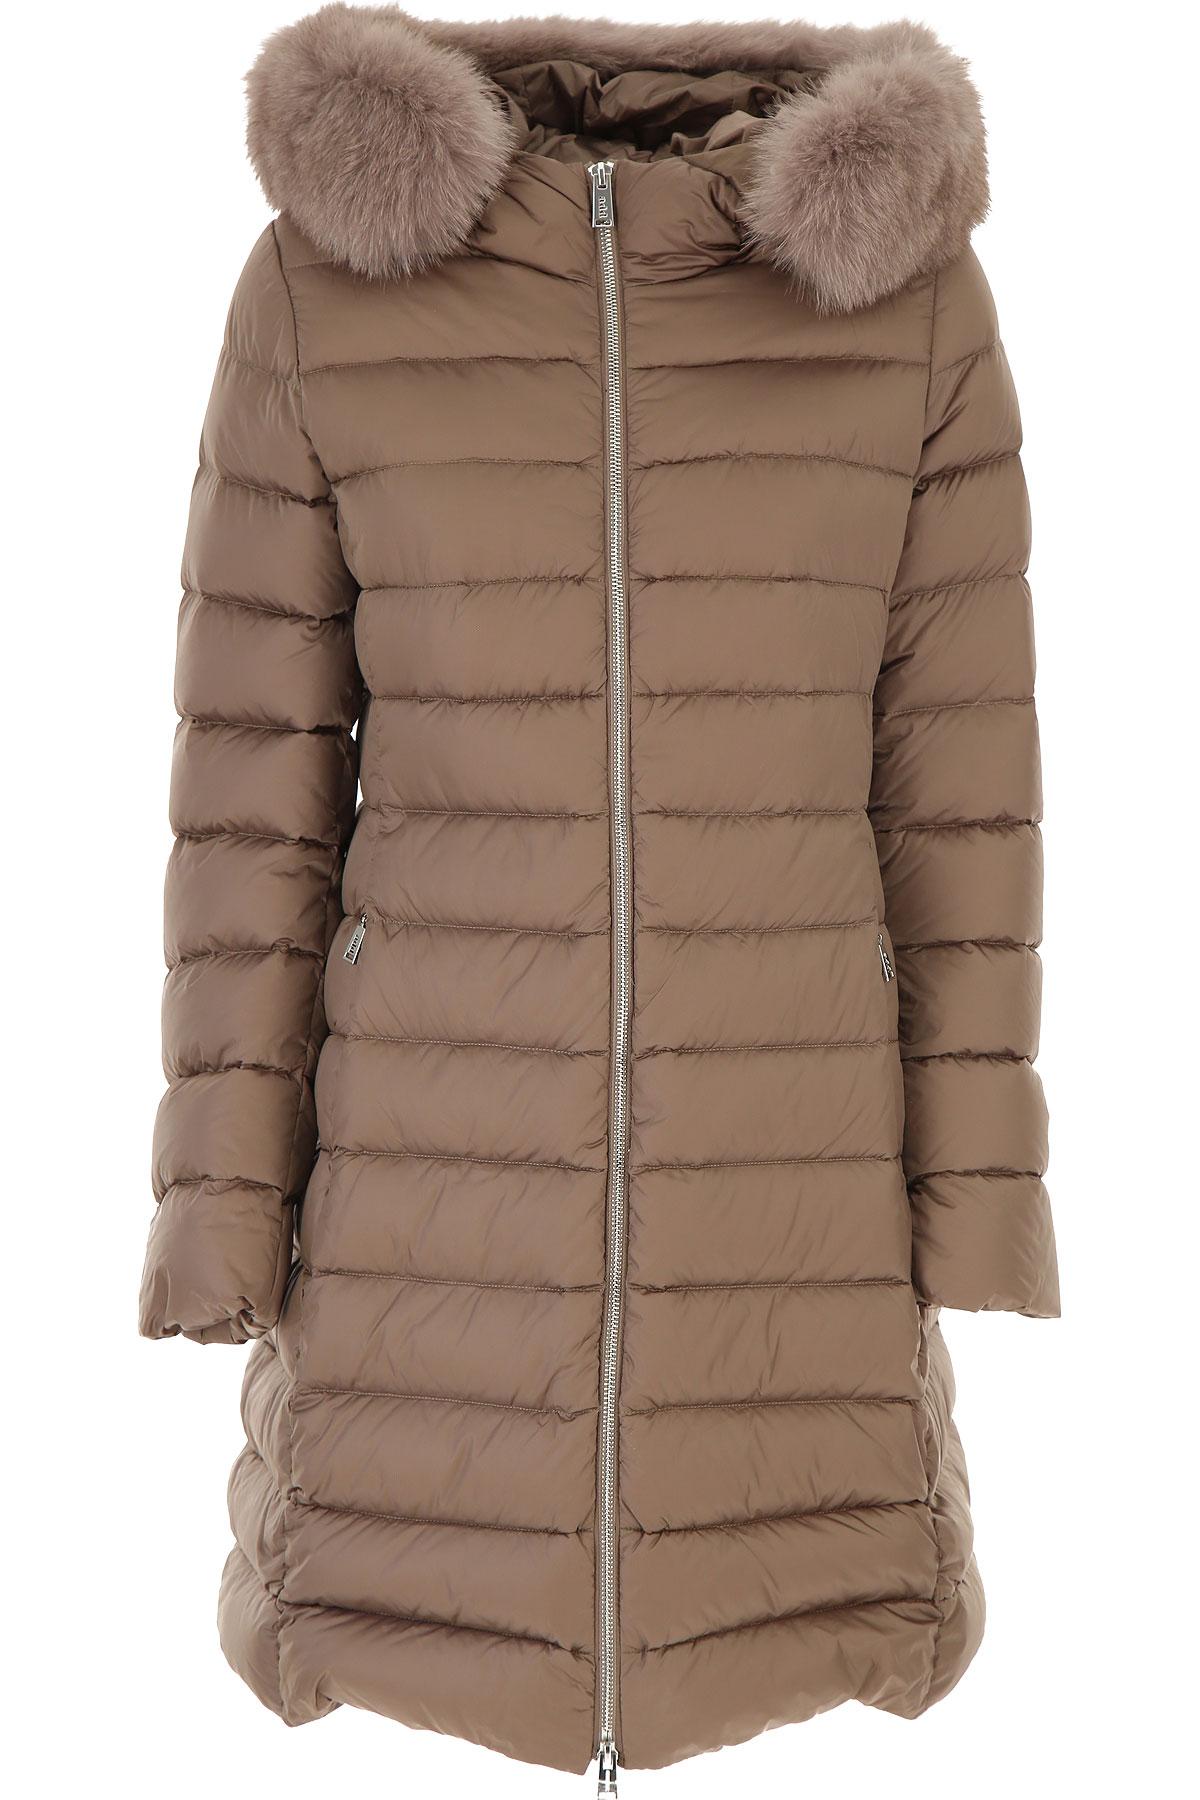 ADD Down Jacket for Women, Puffer Ski Jacket, Castor, Down, 2019, 6 8